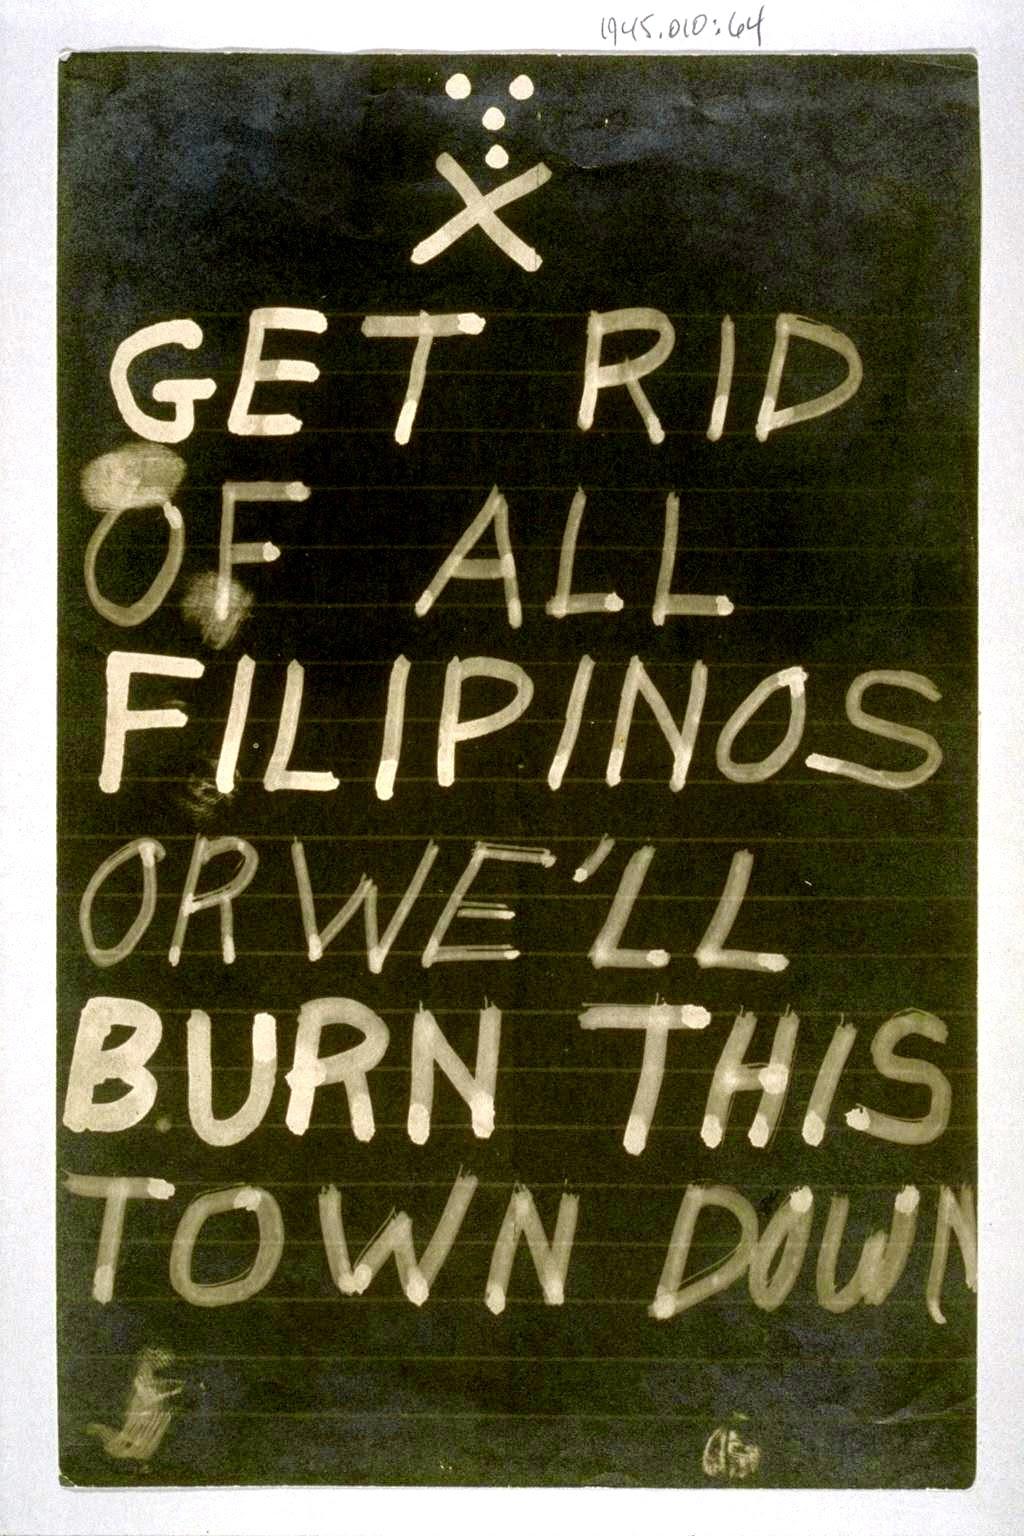 No Filipinos Allowed